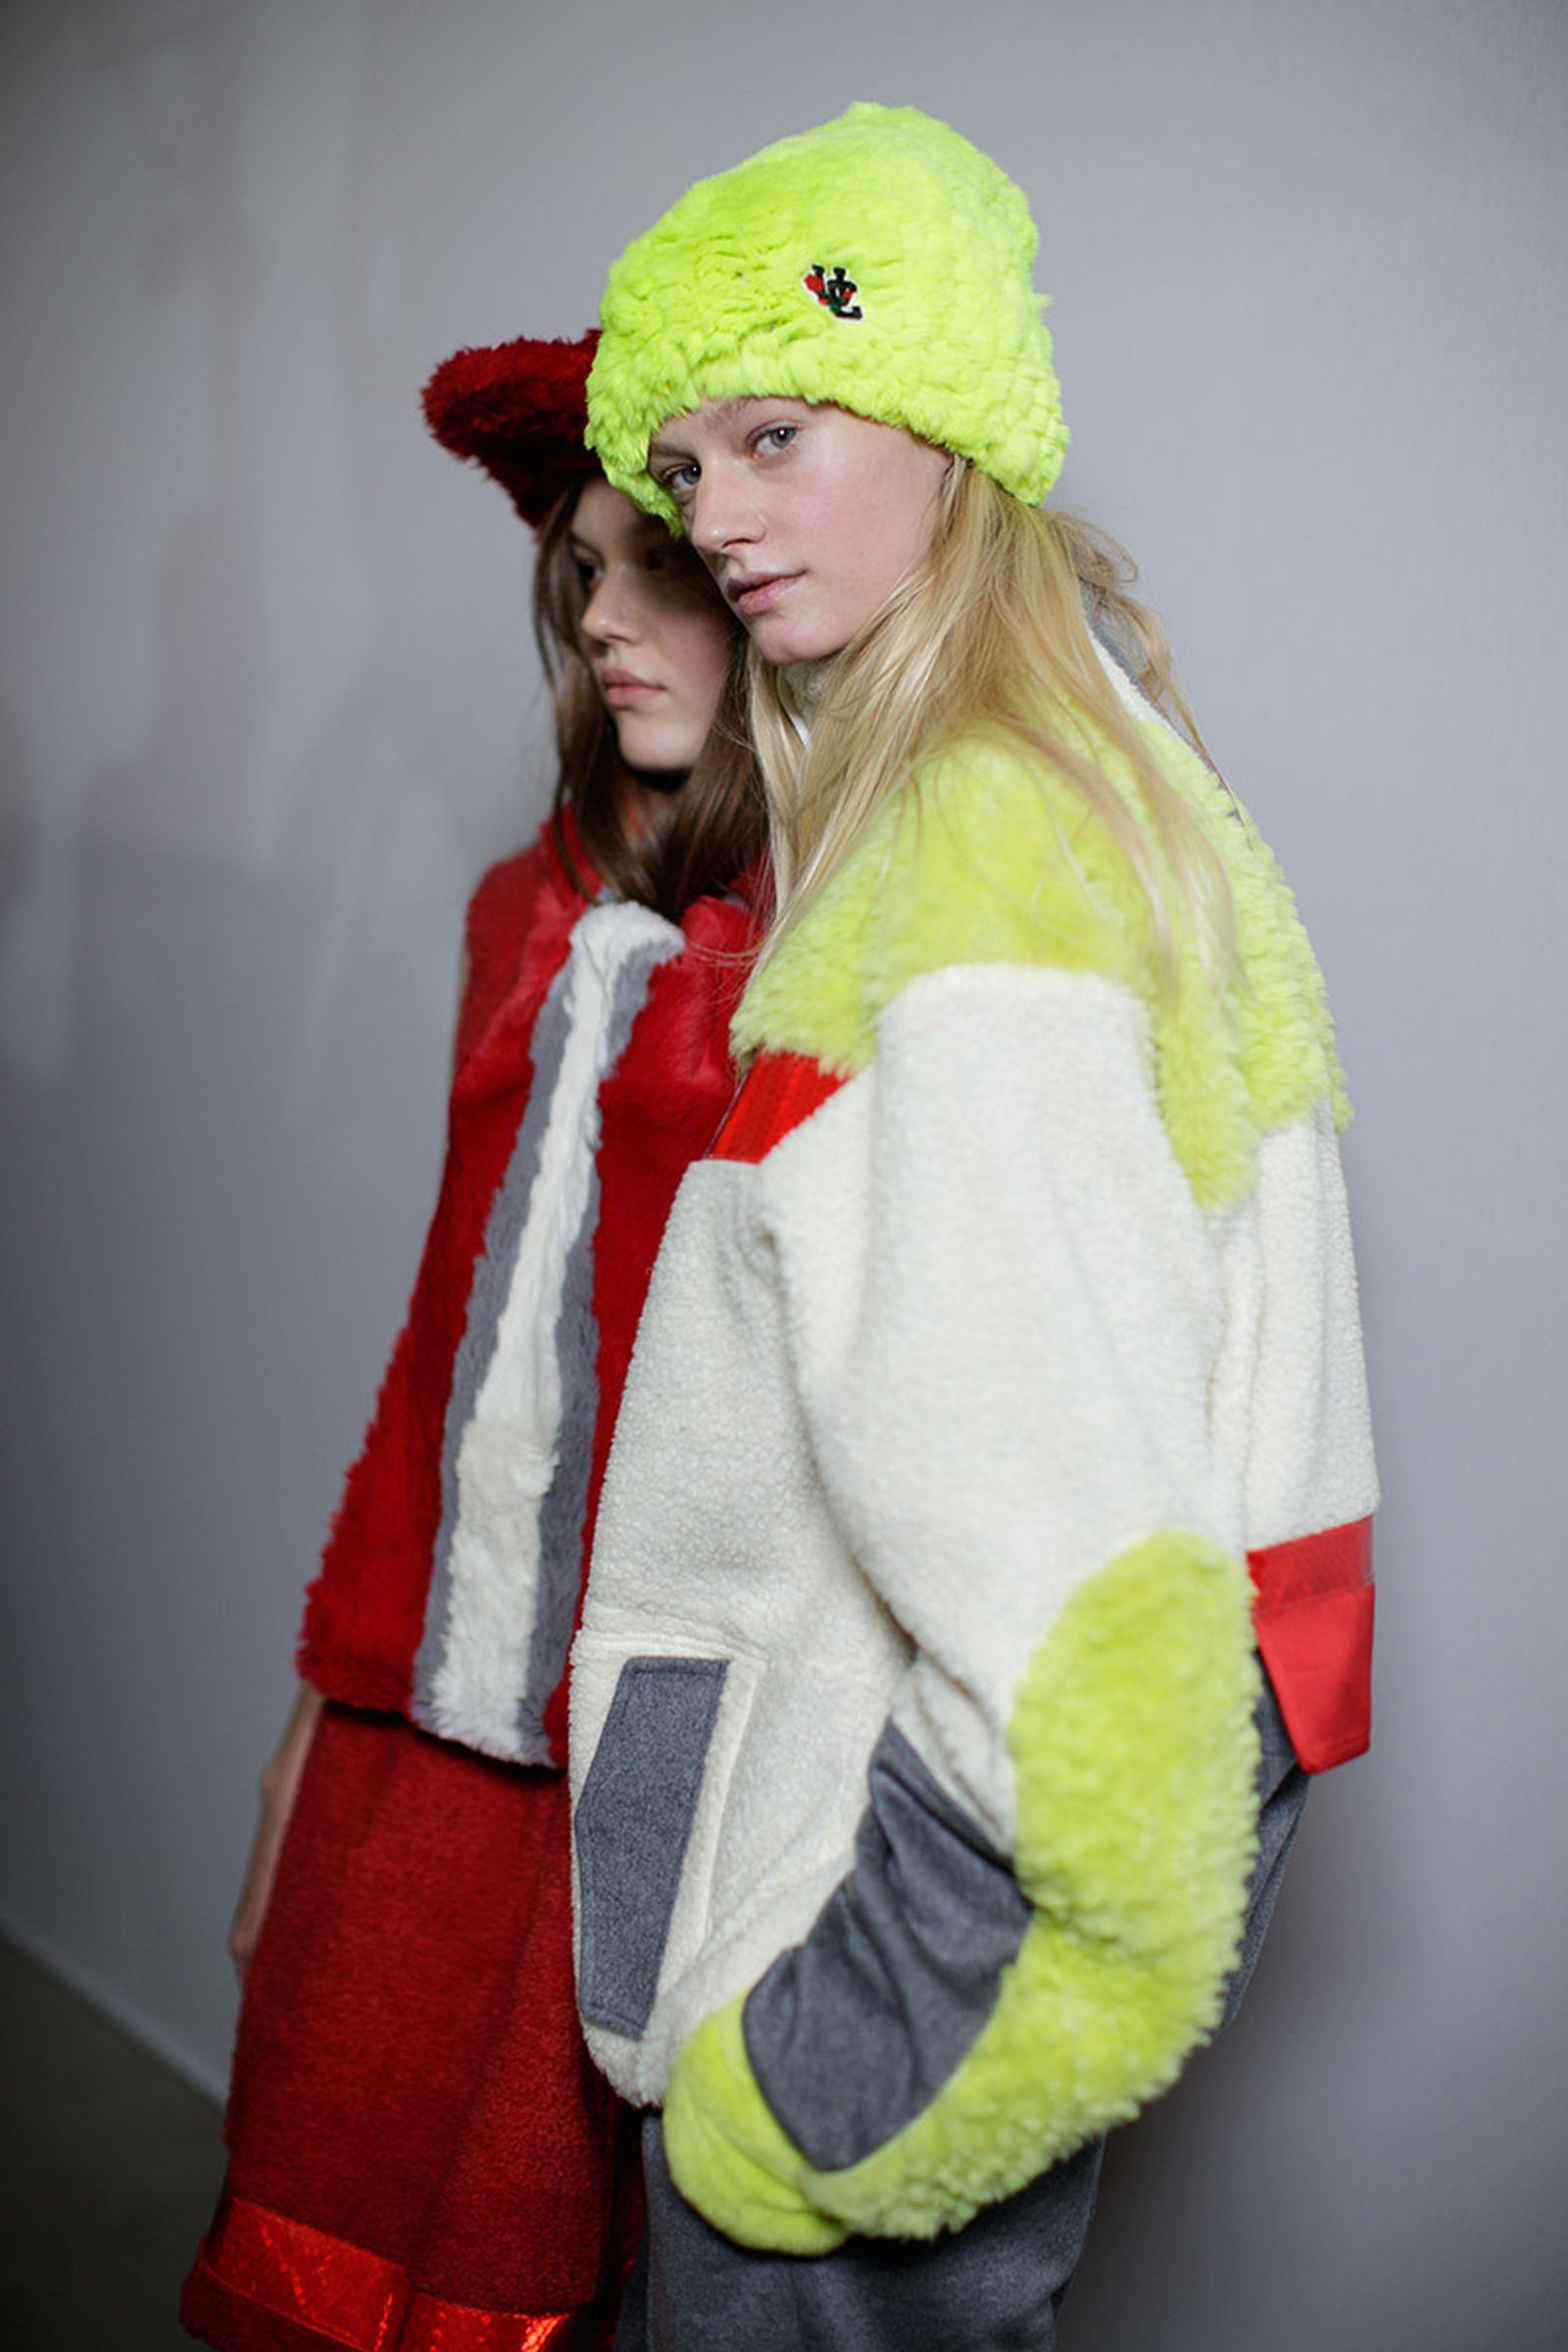 undercover nike react fw18 pfw Fall/WInter 2018 paris fashion week runway